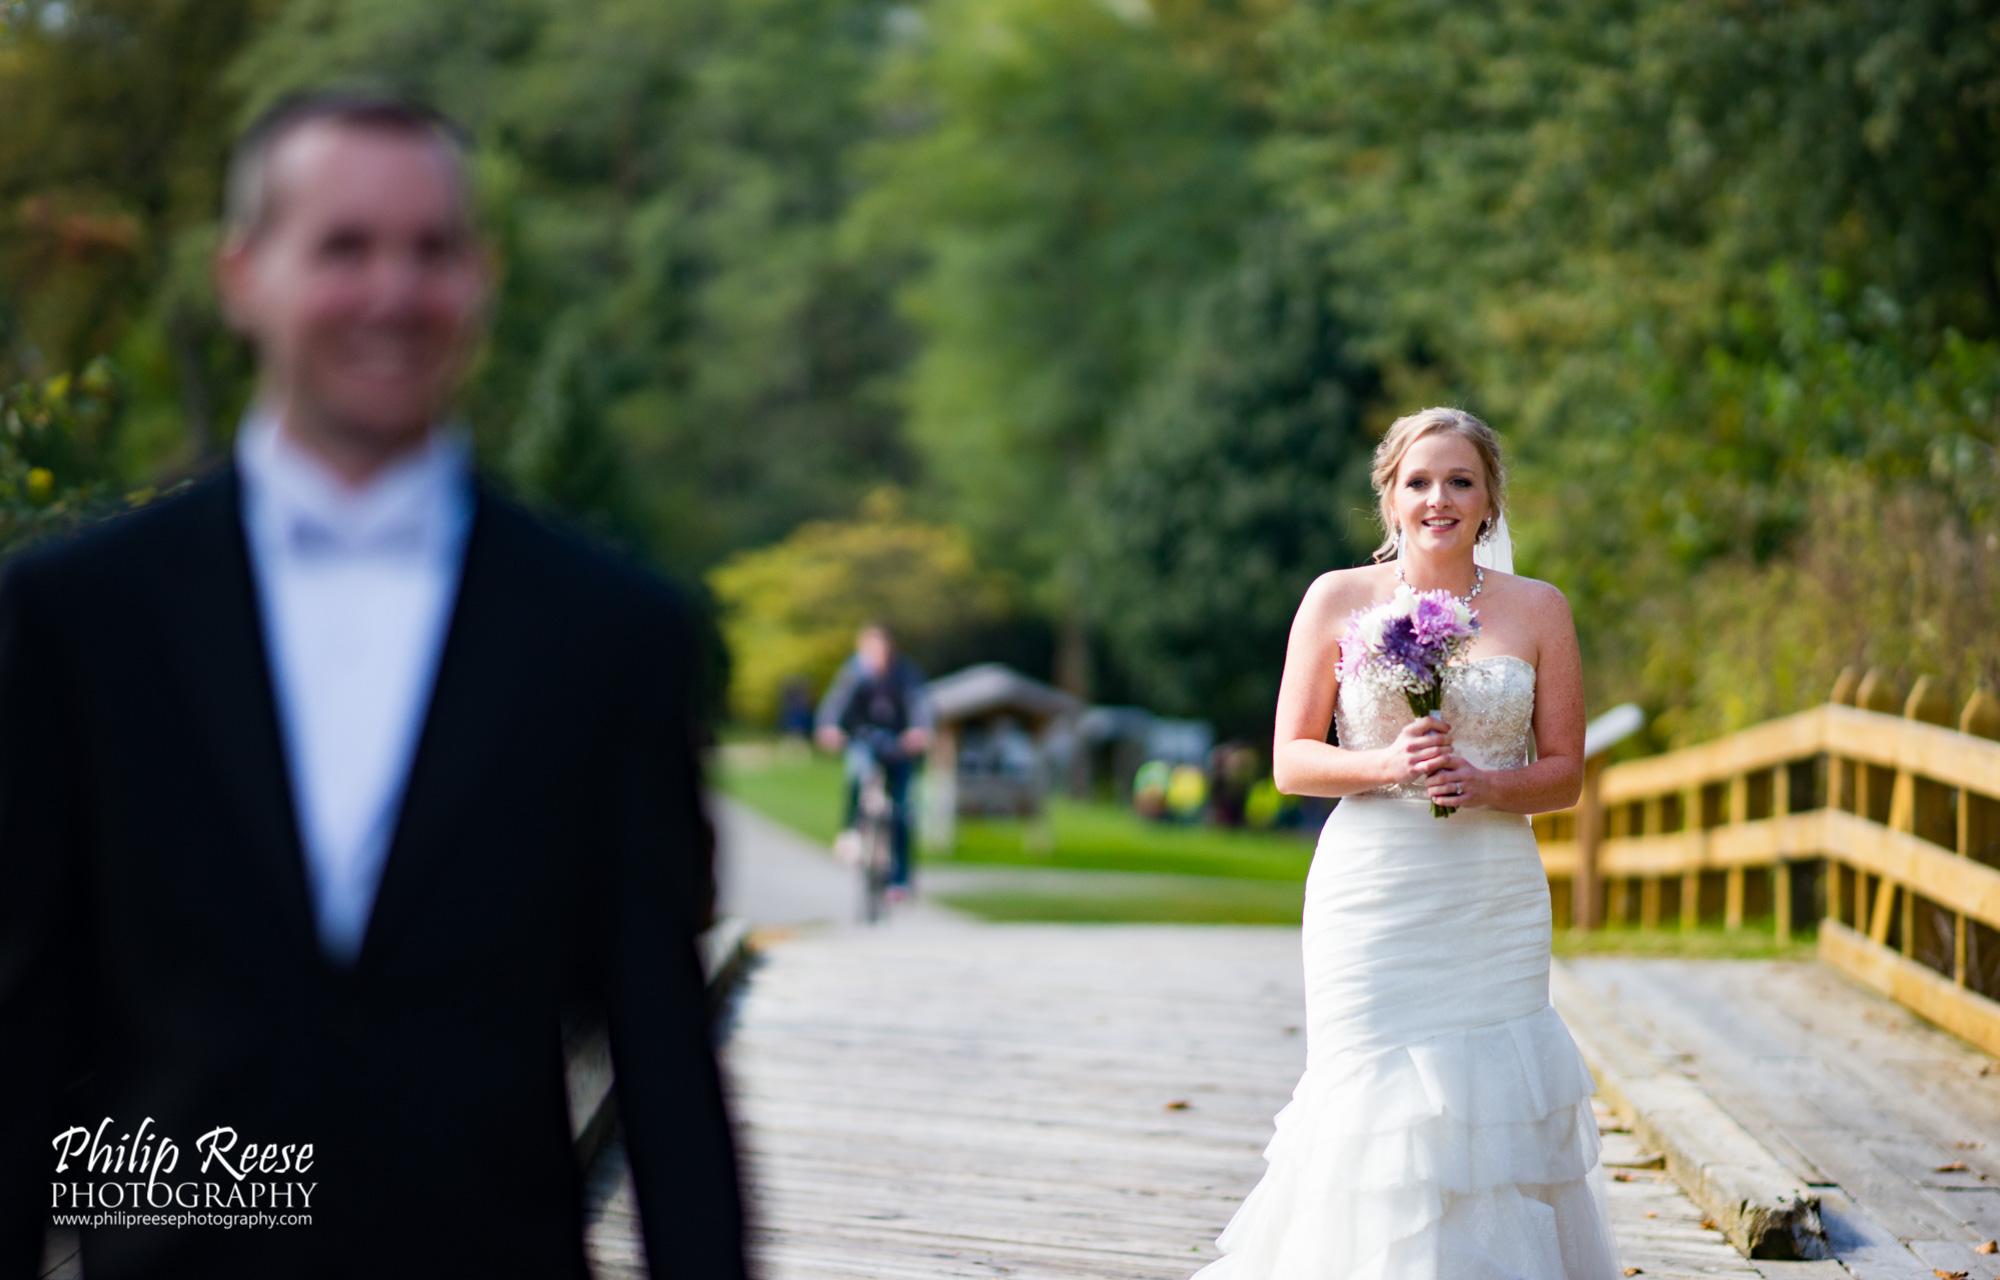 Bruder Wedding 008 - 01231.jpg